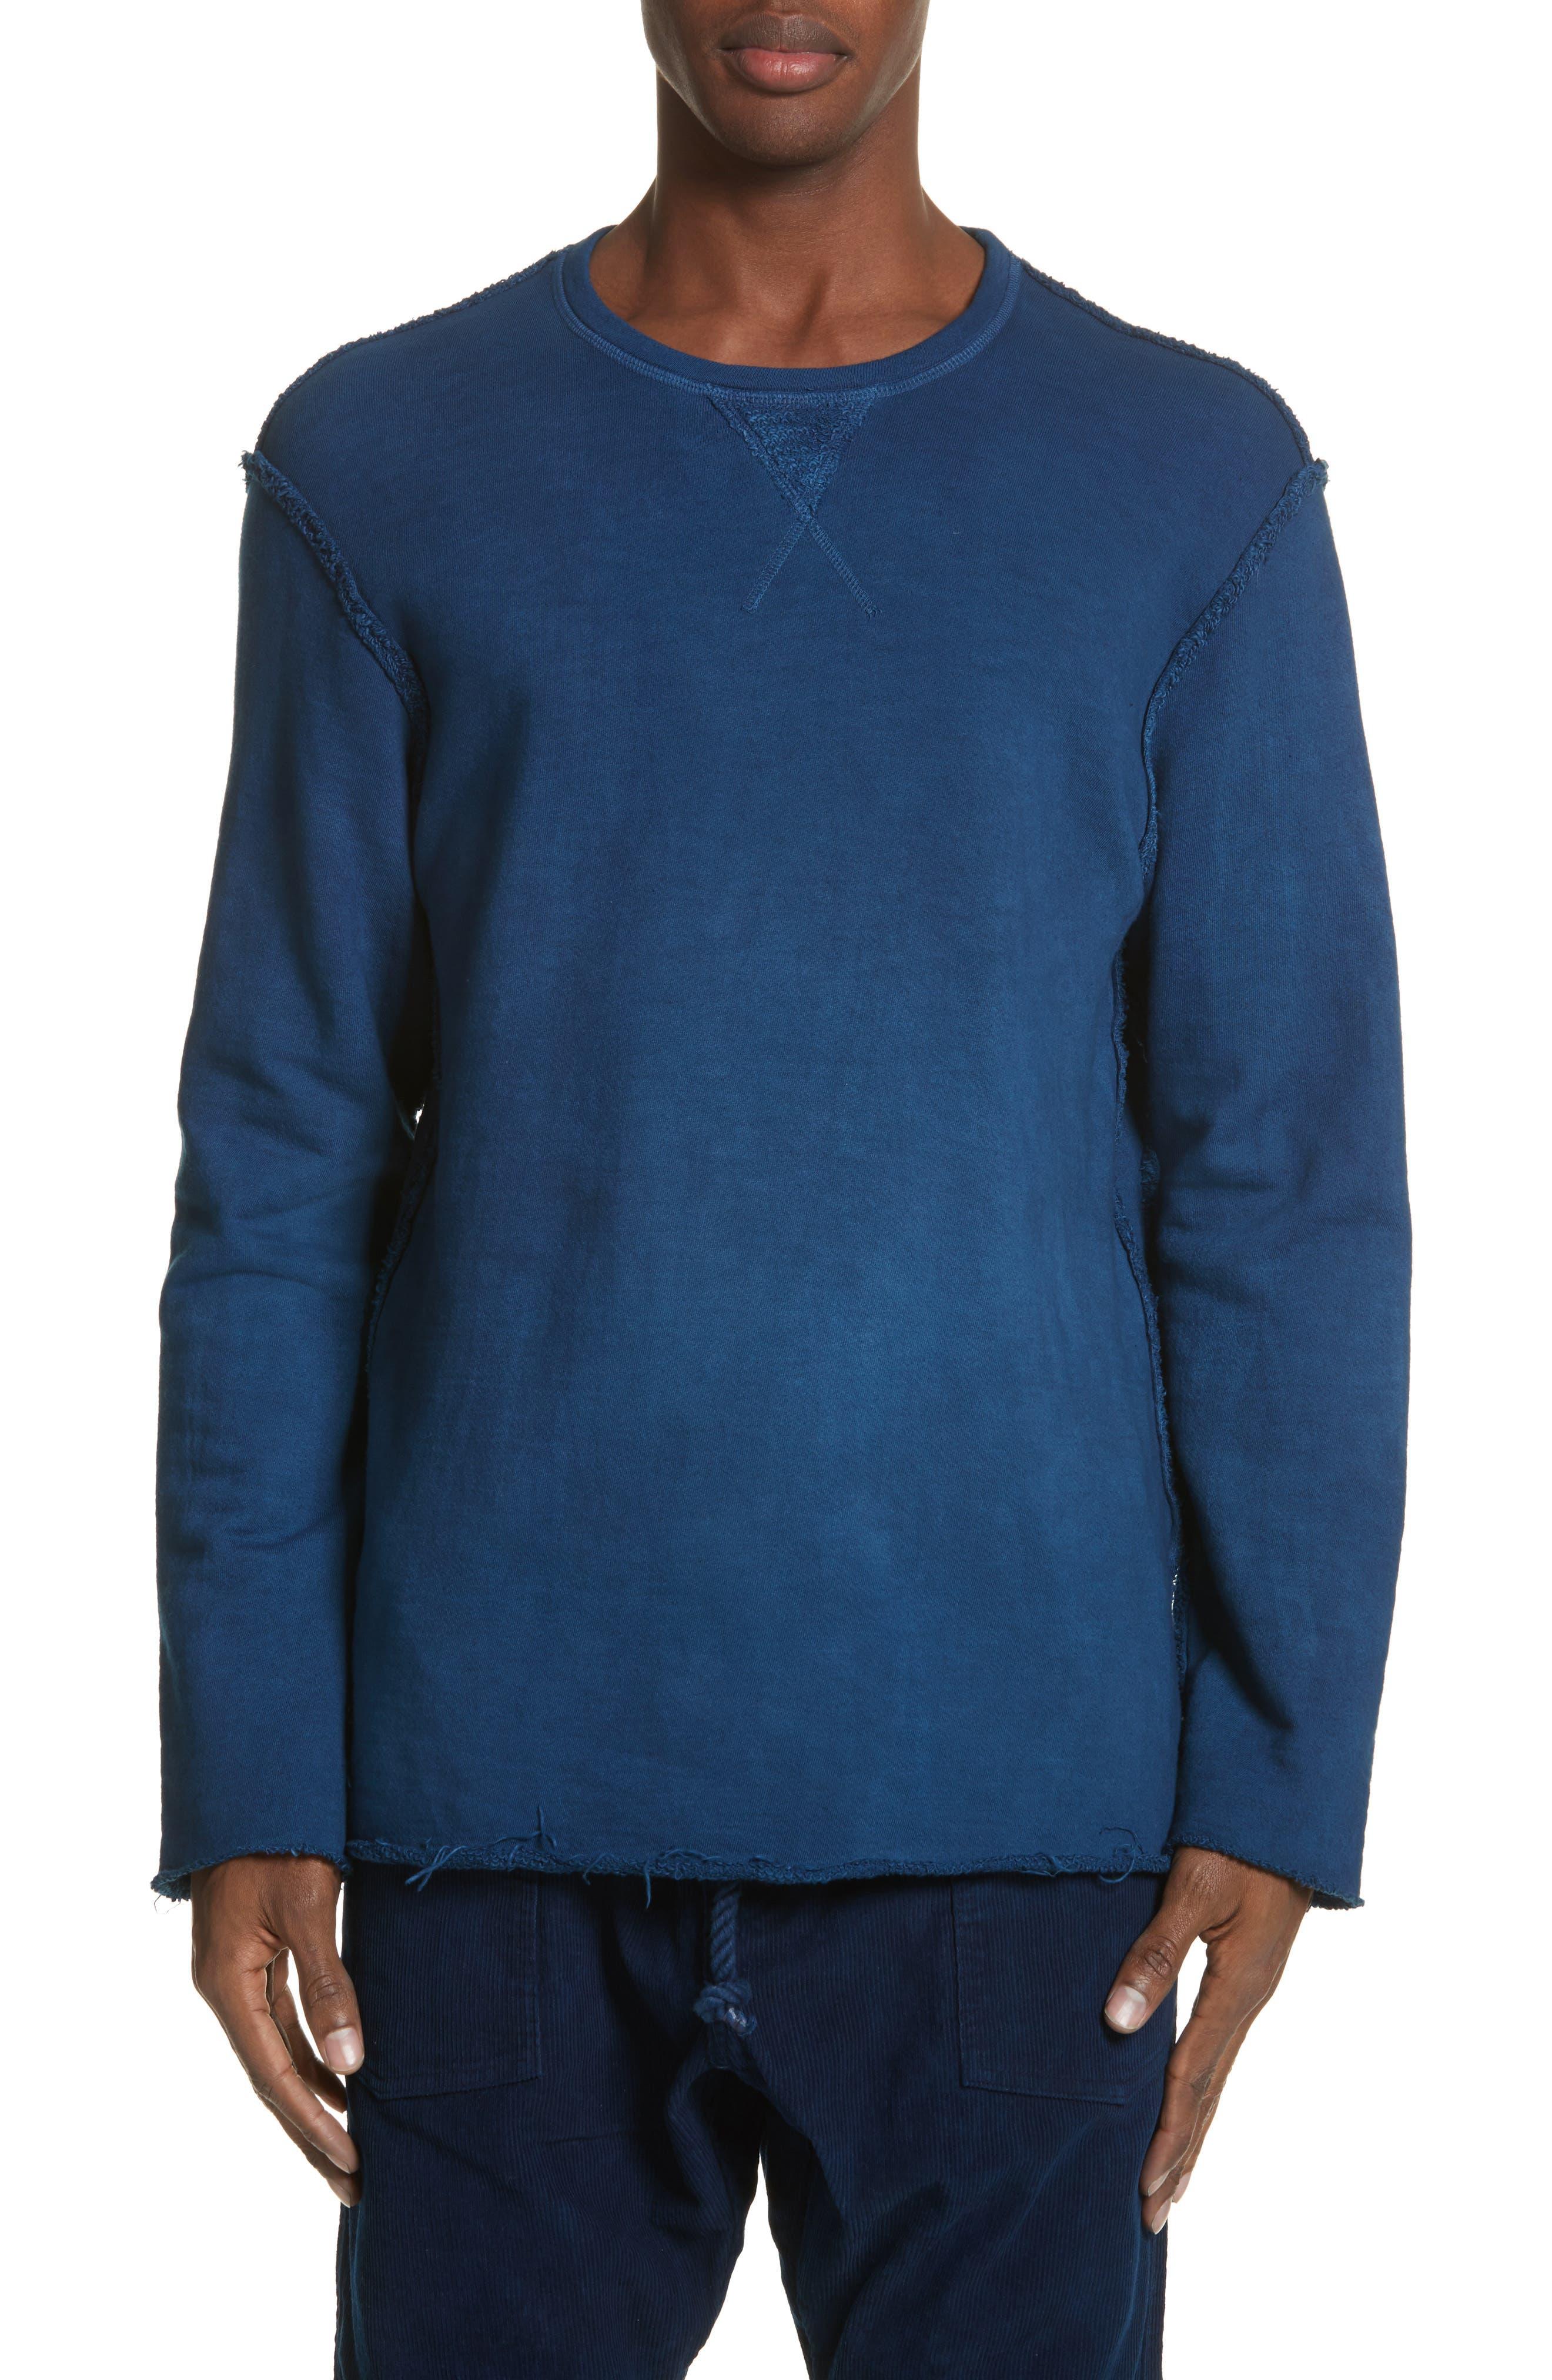 Malibu Reversible Sweatshirt,                             Alternate thumbnail 2, color,                             Indigo